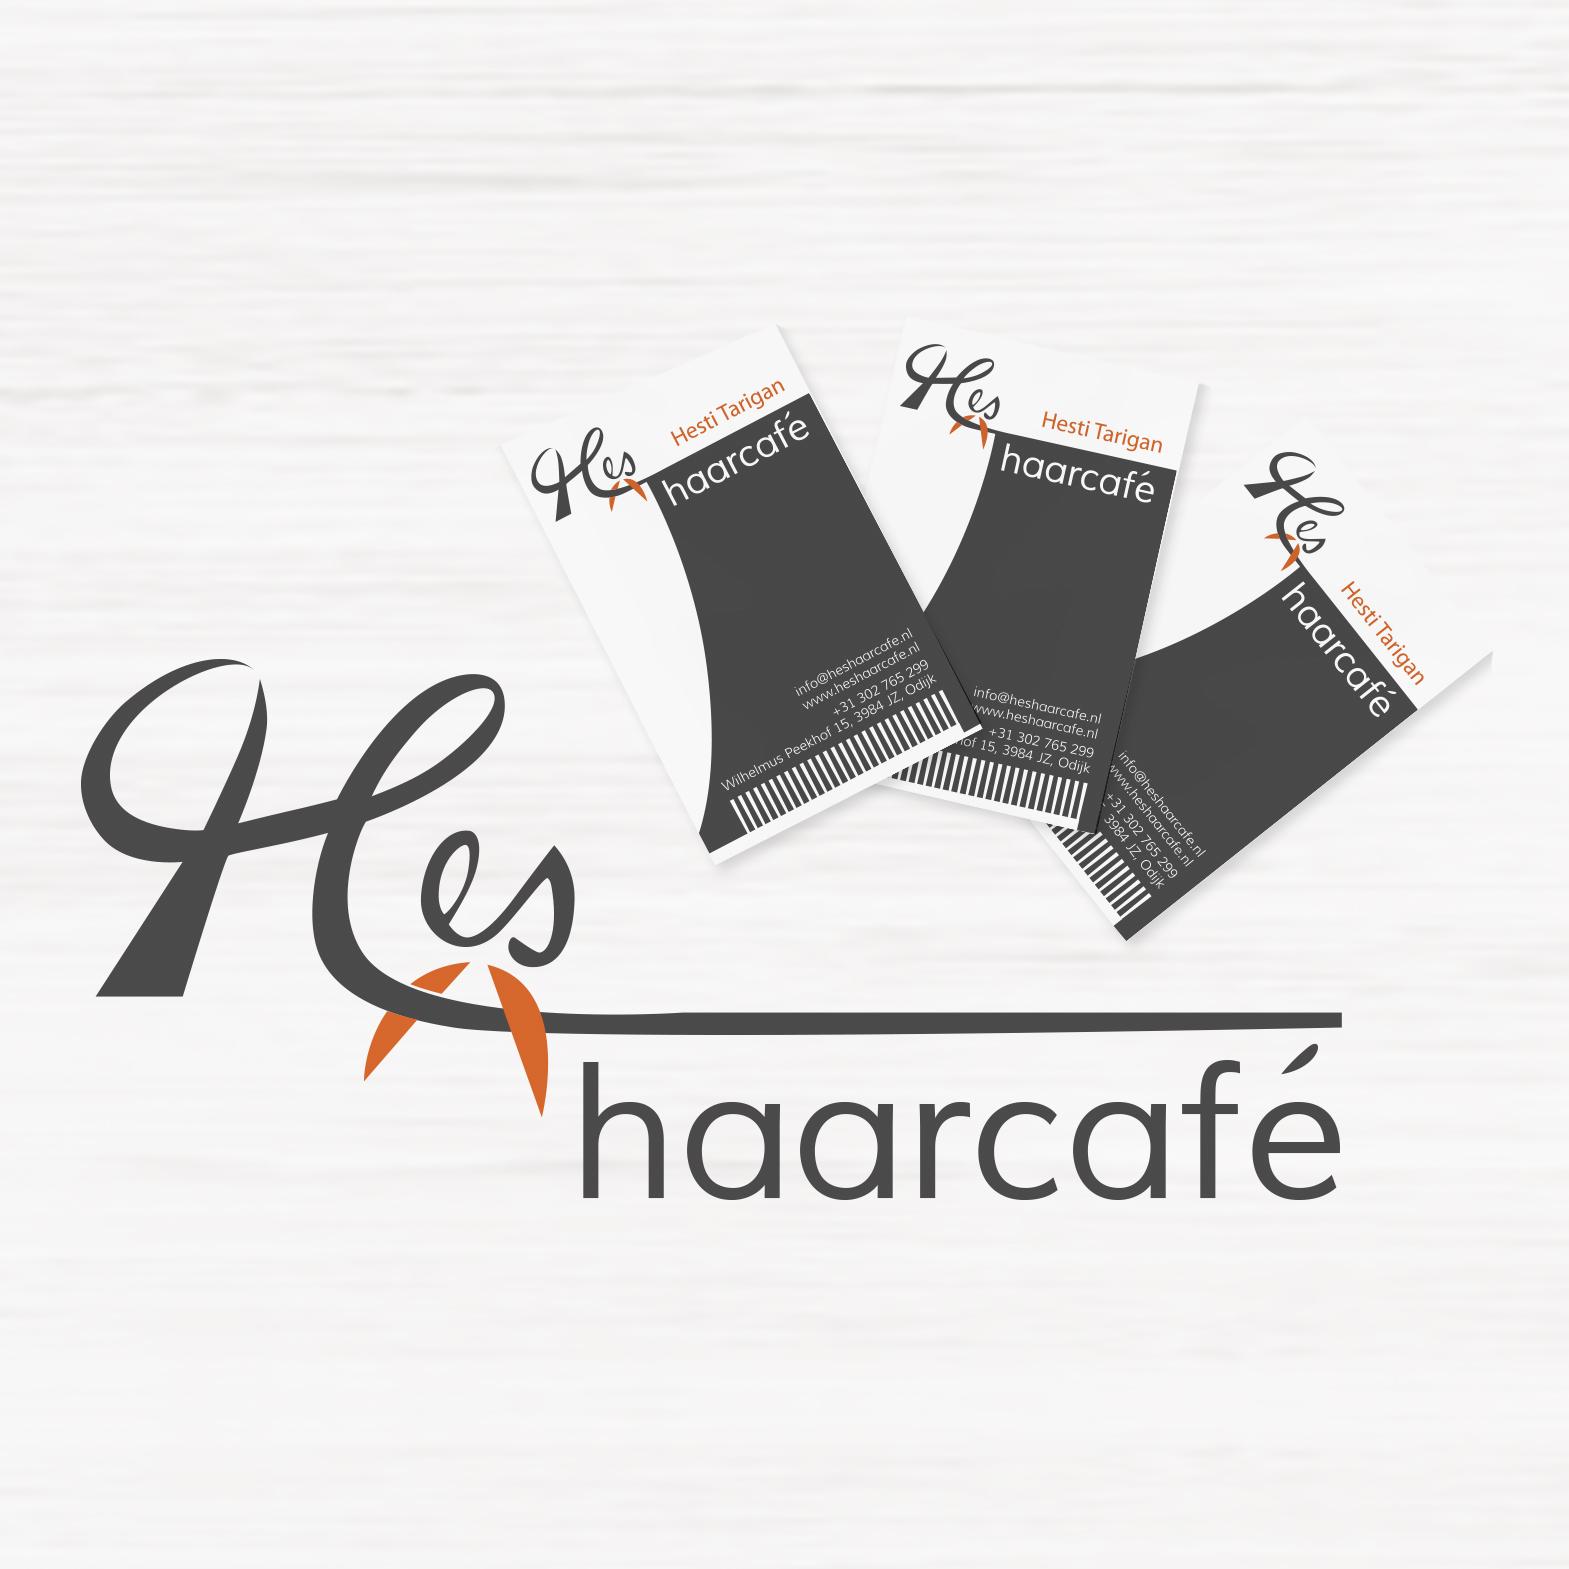 Logo & Business card design of Haarcafé